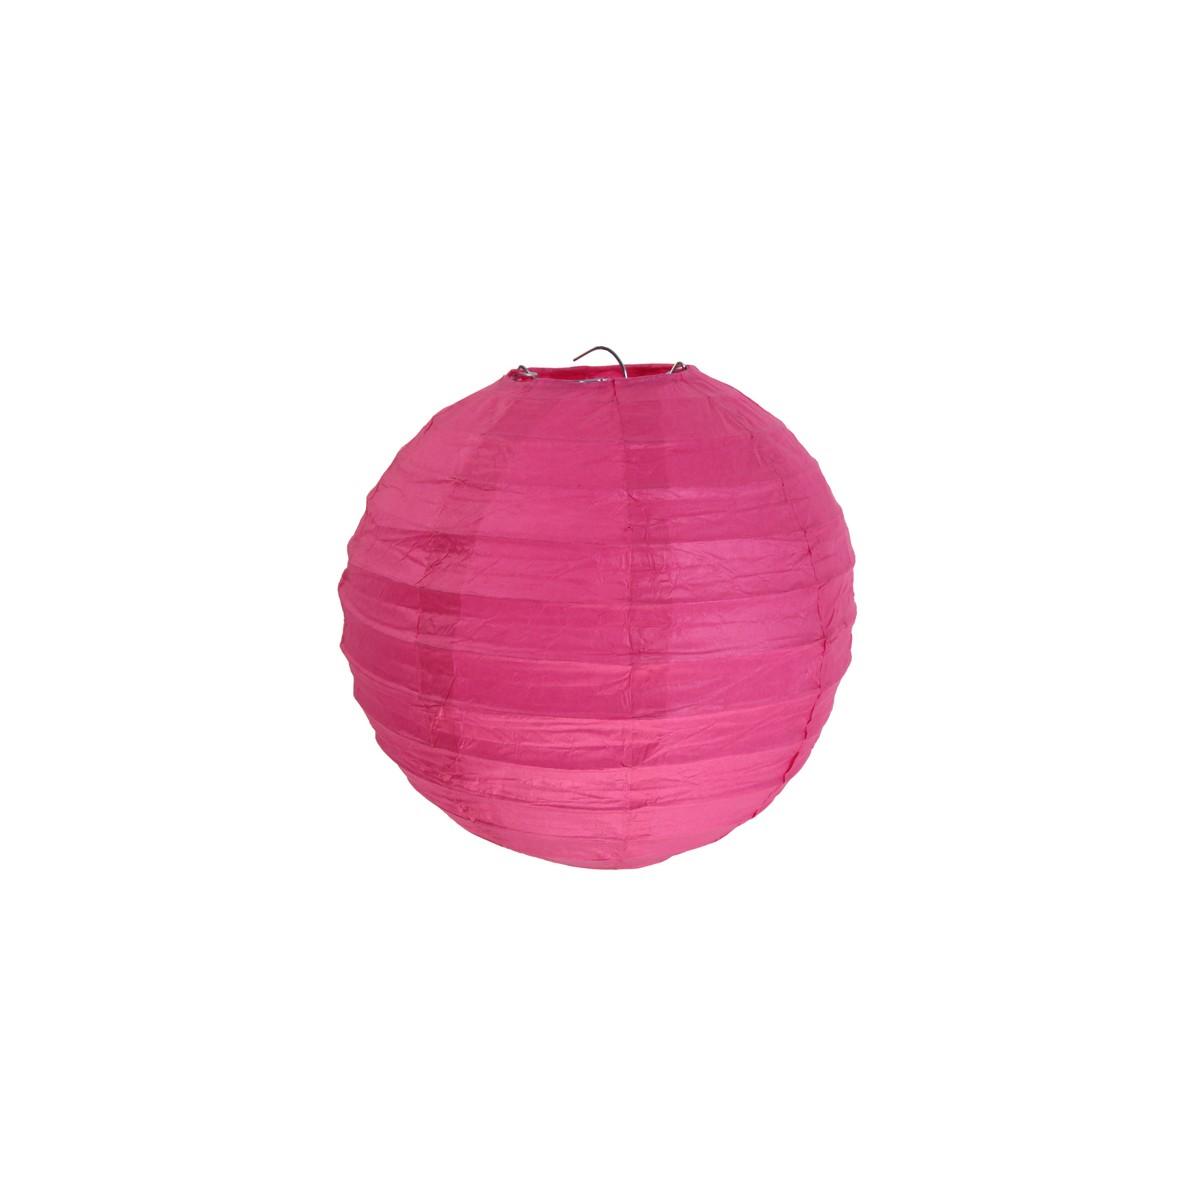 2x Lanterne Papier 30cm - Fuchsia